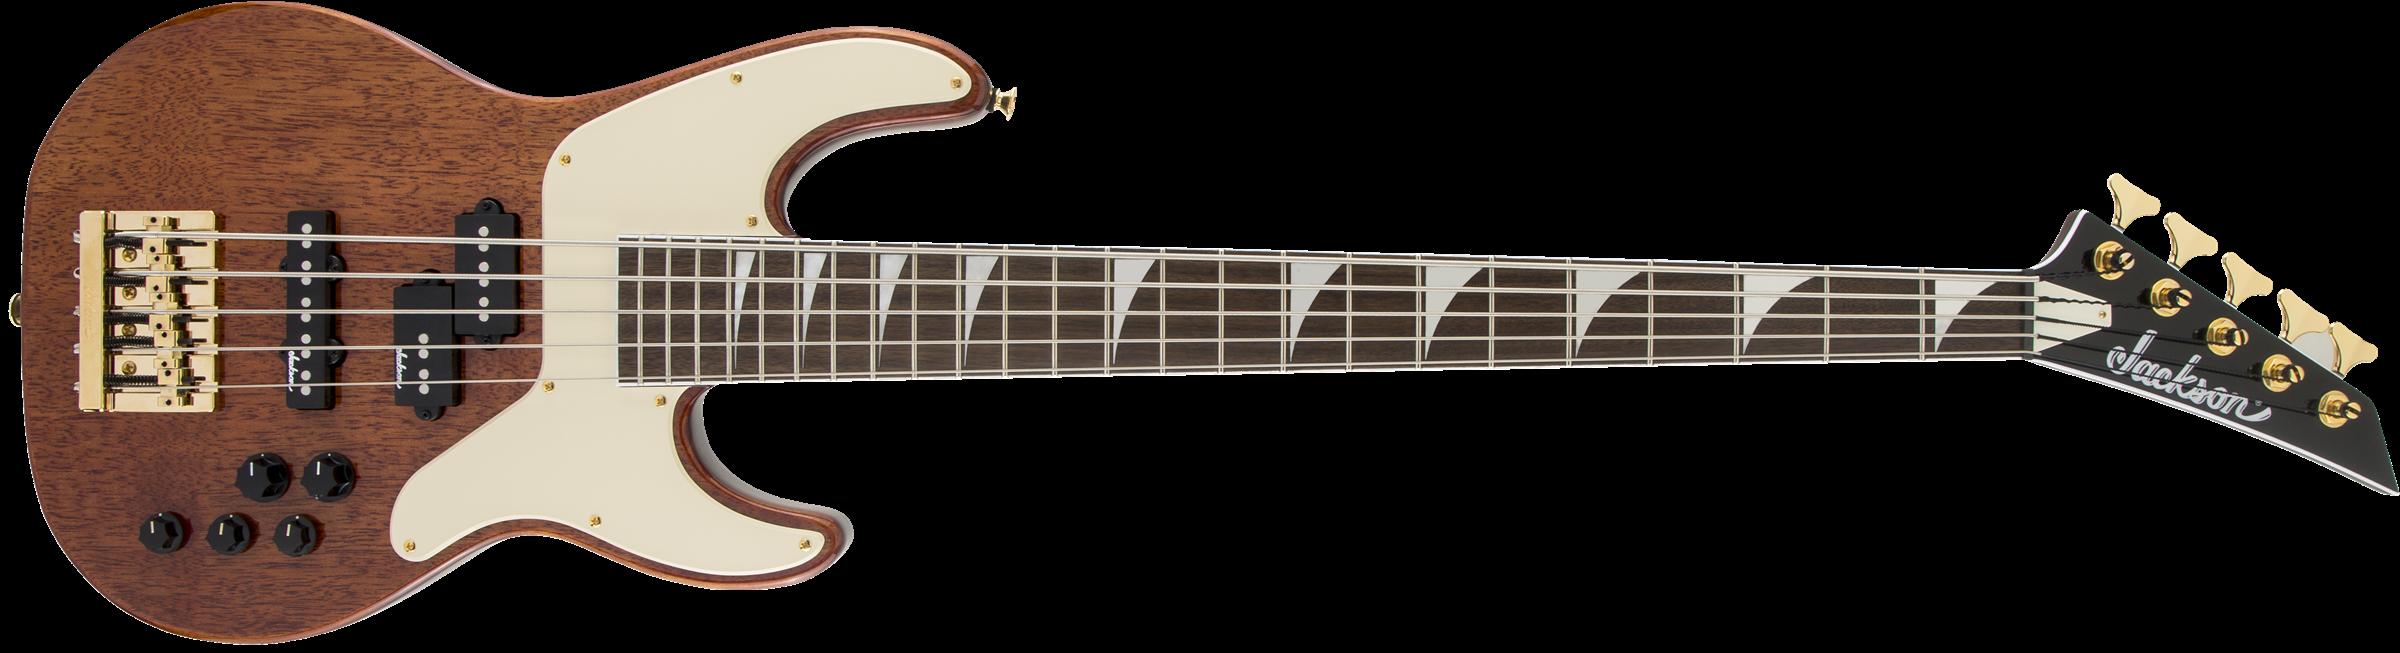 JACKSON X Series Concert Bass CBXNT V MAH, Laurel Fingerboard, Natural